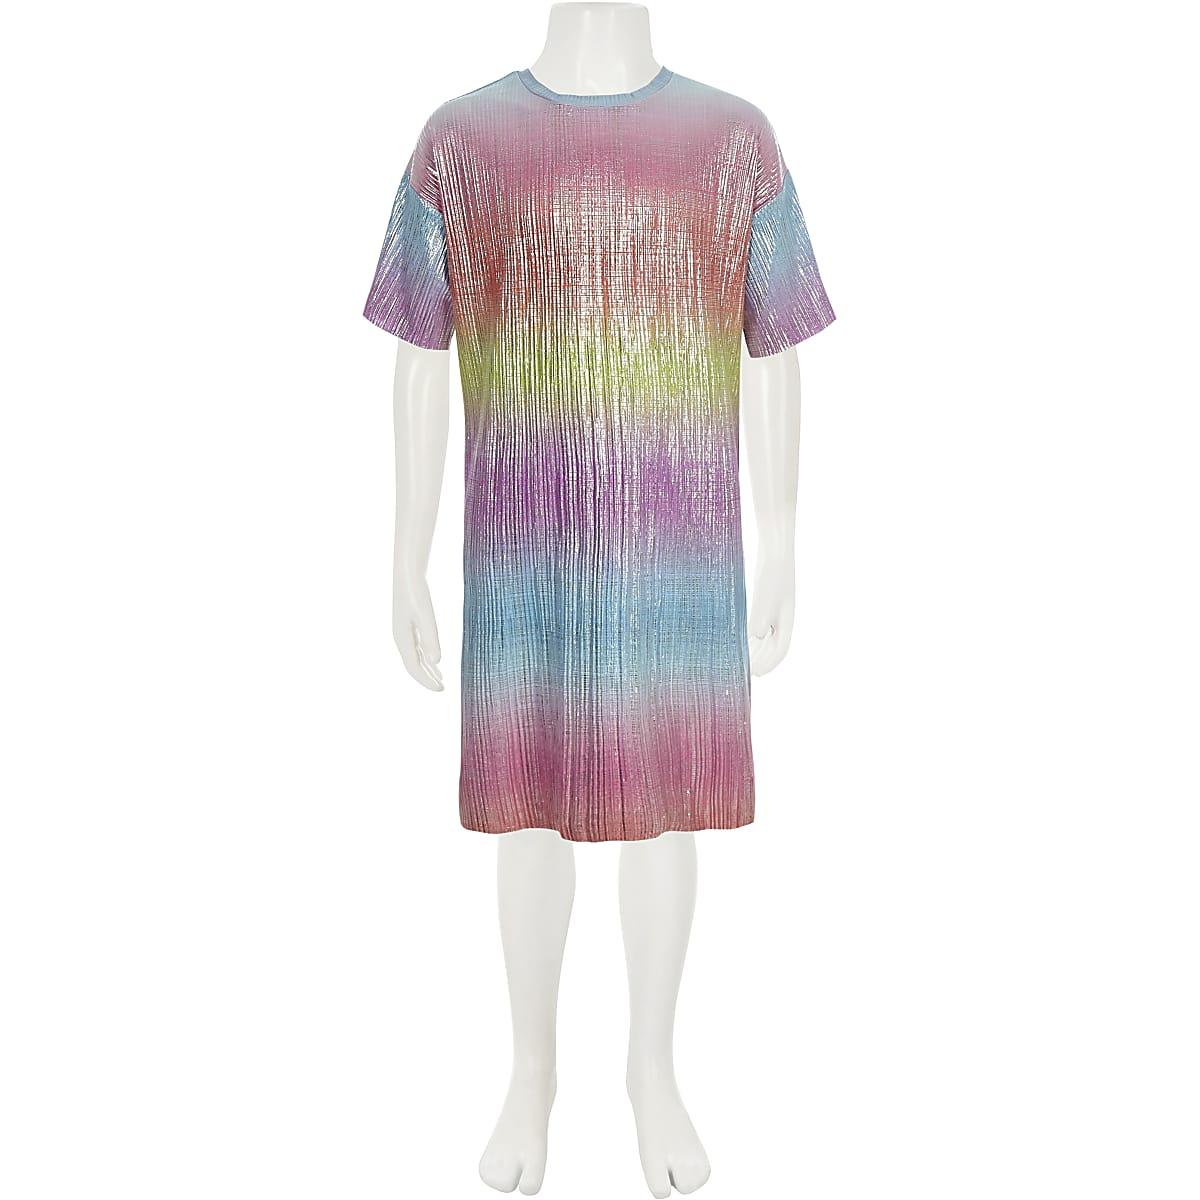 d5fcbdd32e10 Girls pink rainbow plisse T-shirt dress - Day Dresses - Dresses - girls